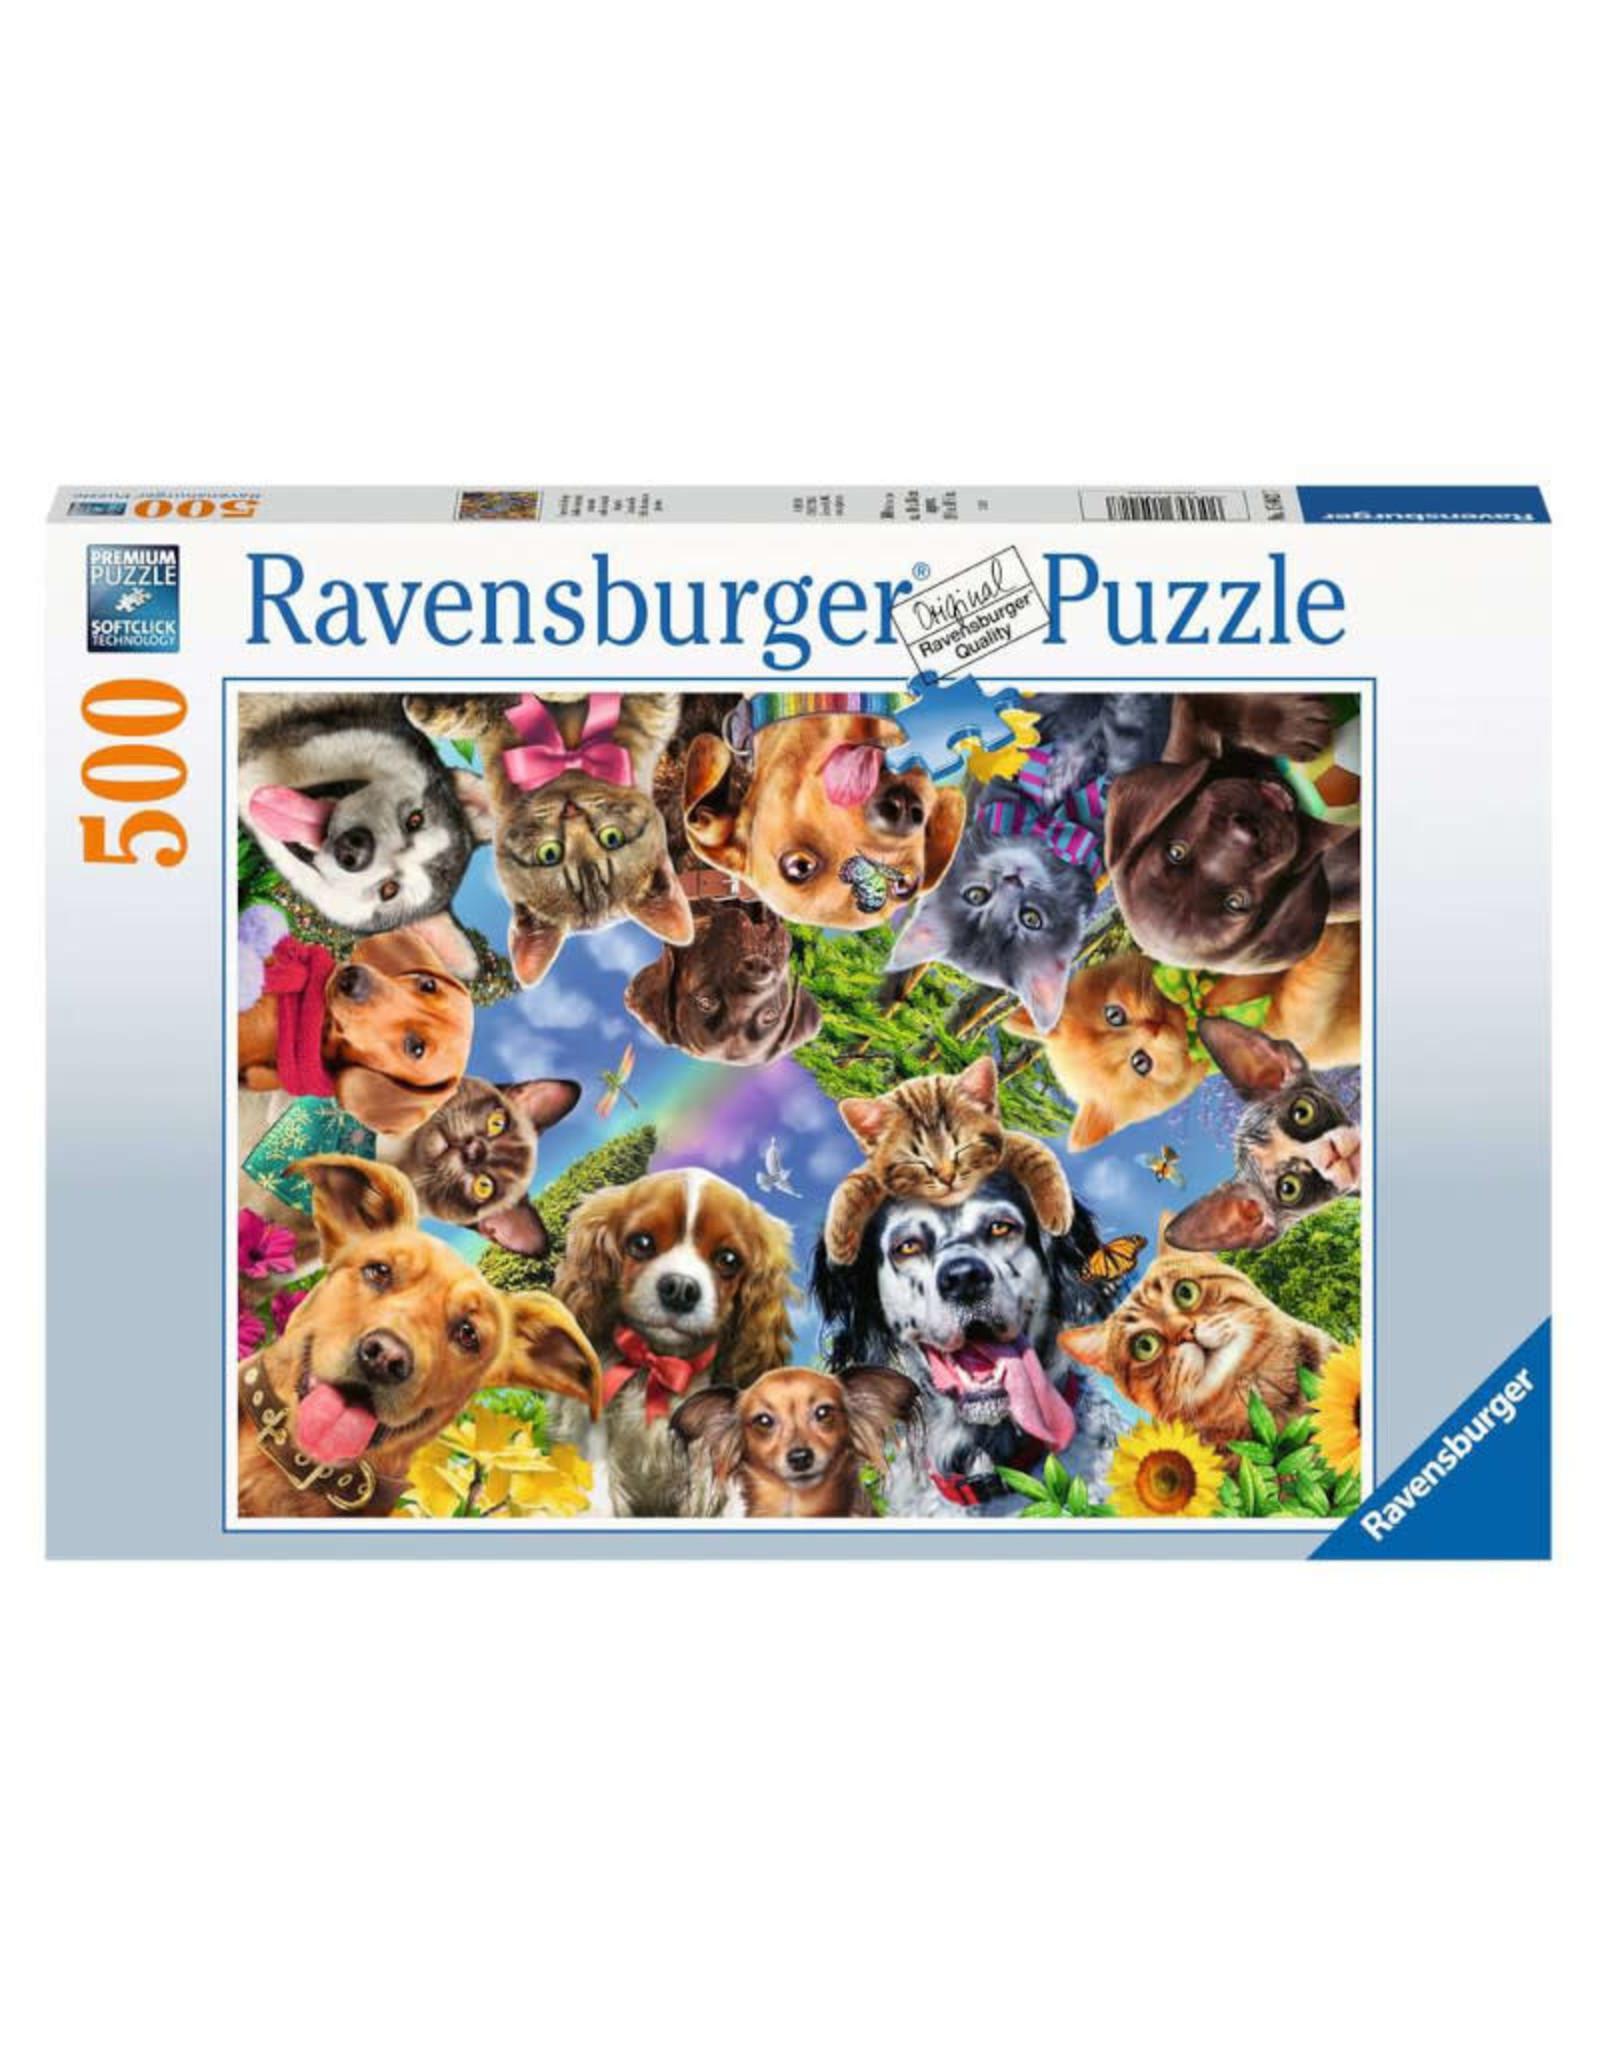 Ravensburger Funny Animal Selfie Puzzle 500 PCS